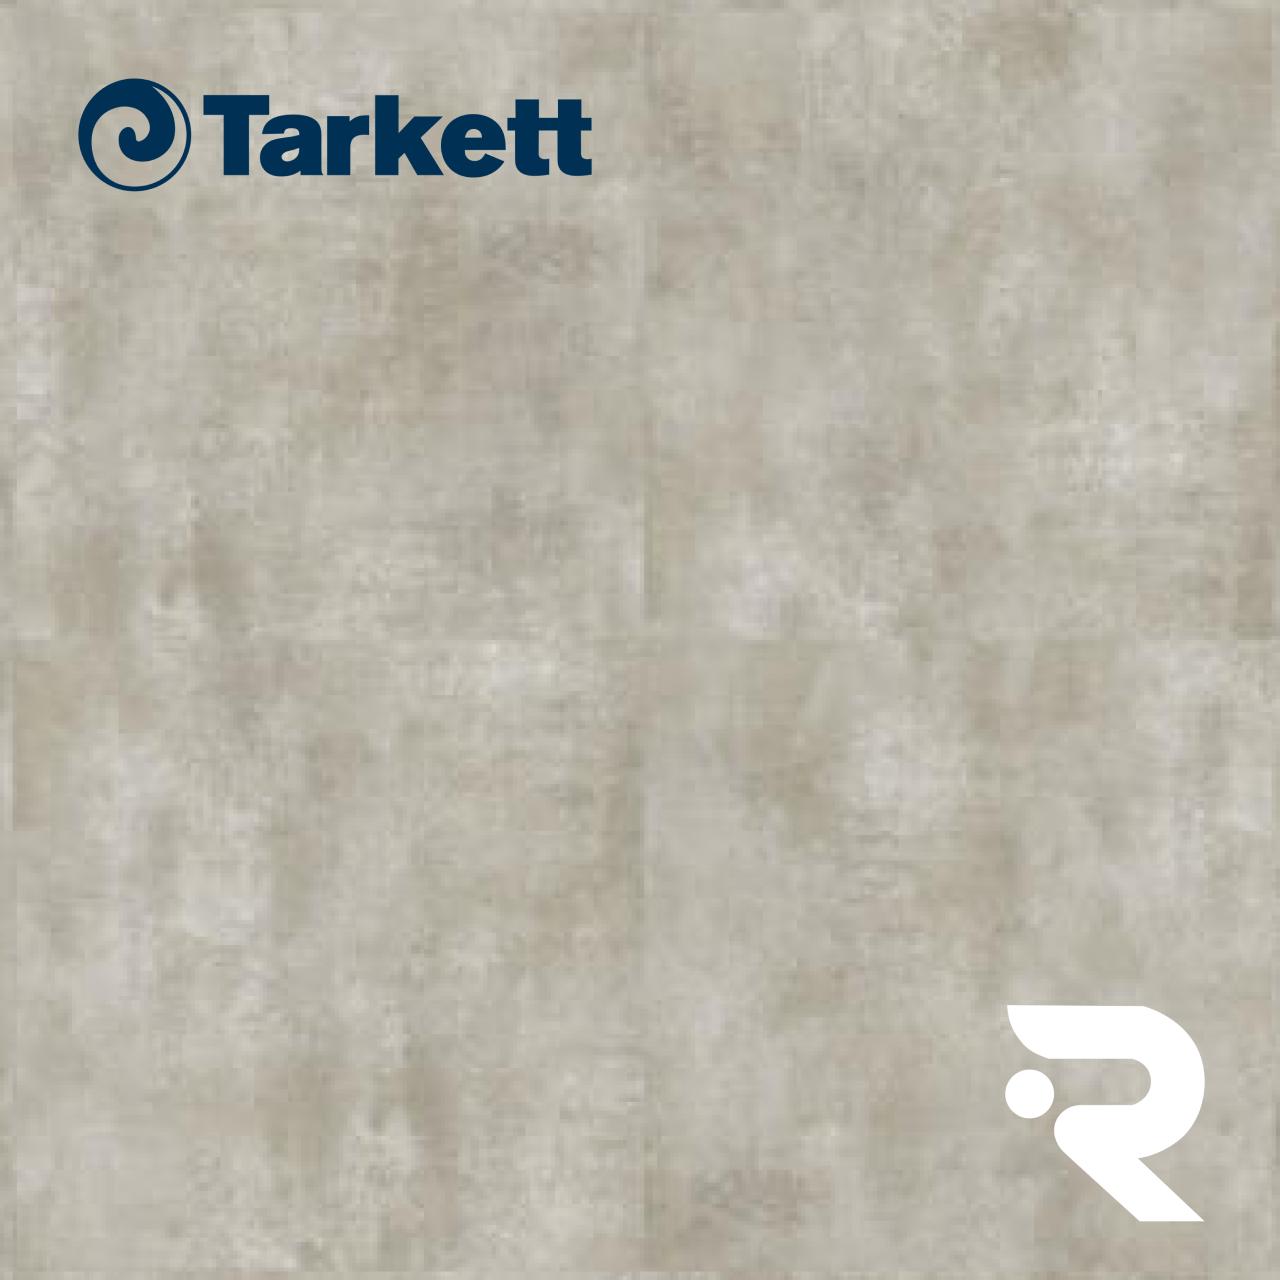 🌳 ПВХ плитка Tarkett | ModularT 7 - BETON ORIGINAL | Art Vinyl | 600 x 600 мм